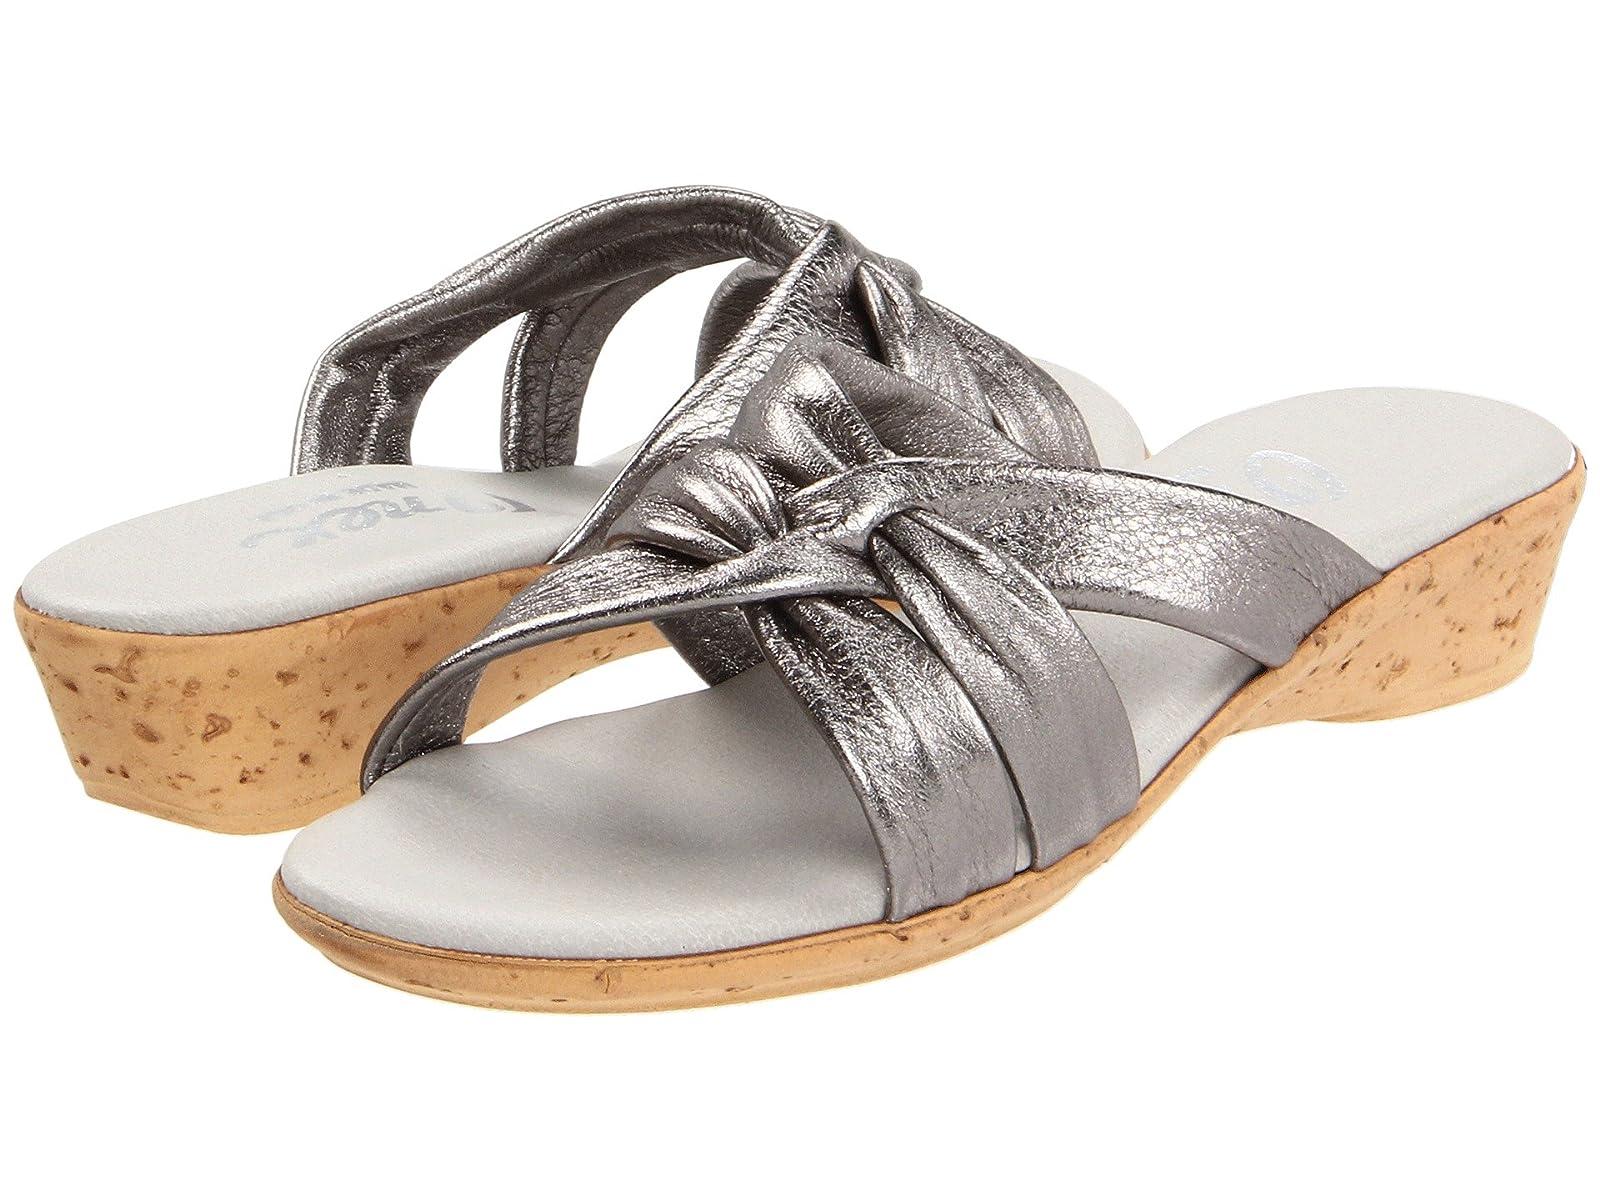 Onex SailAtmospheric grades have affordable shoes